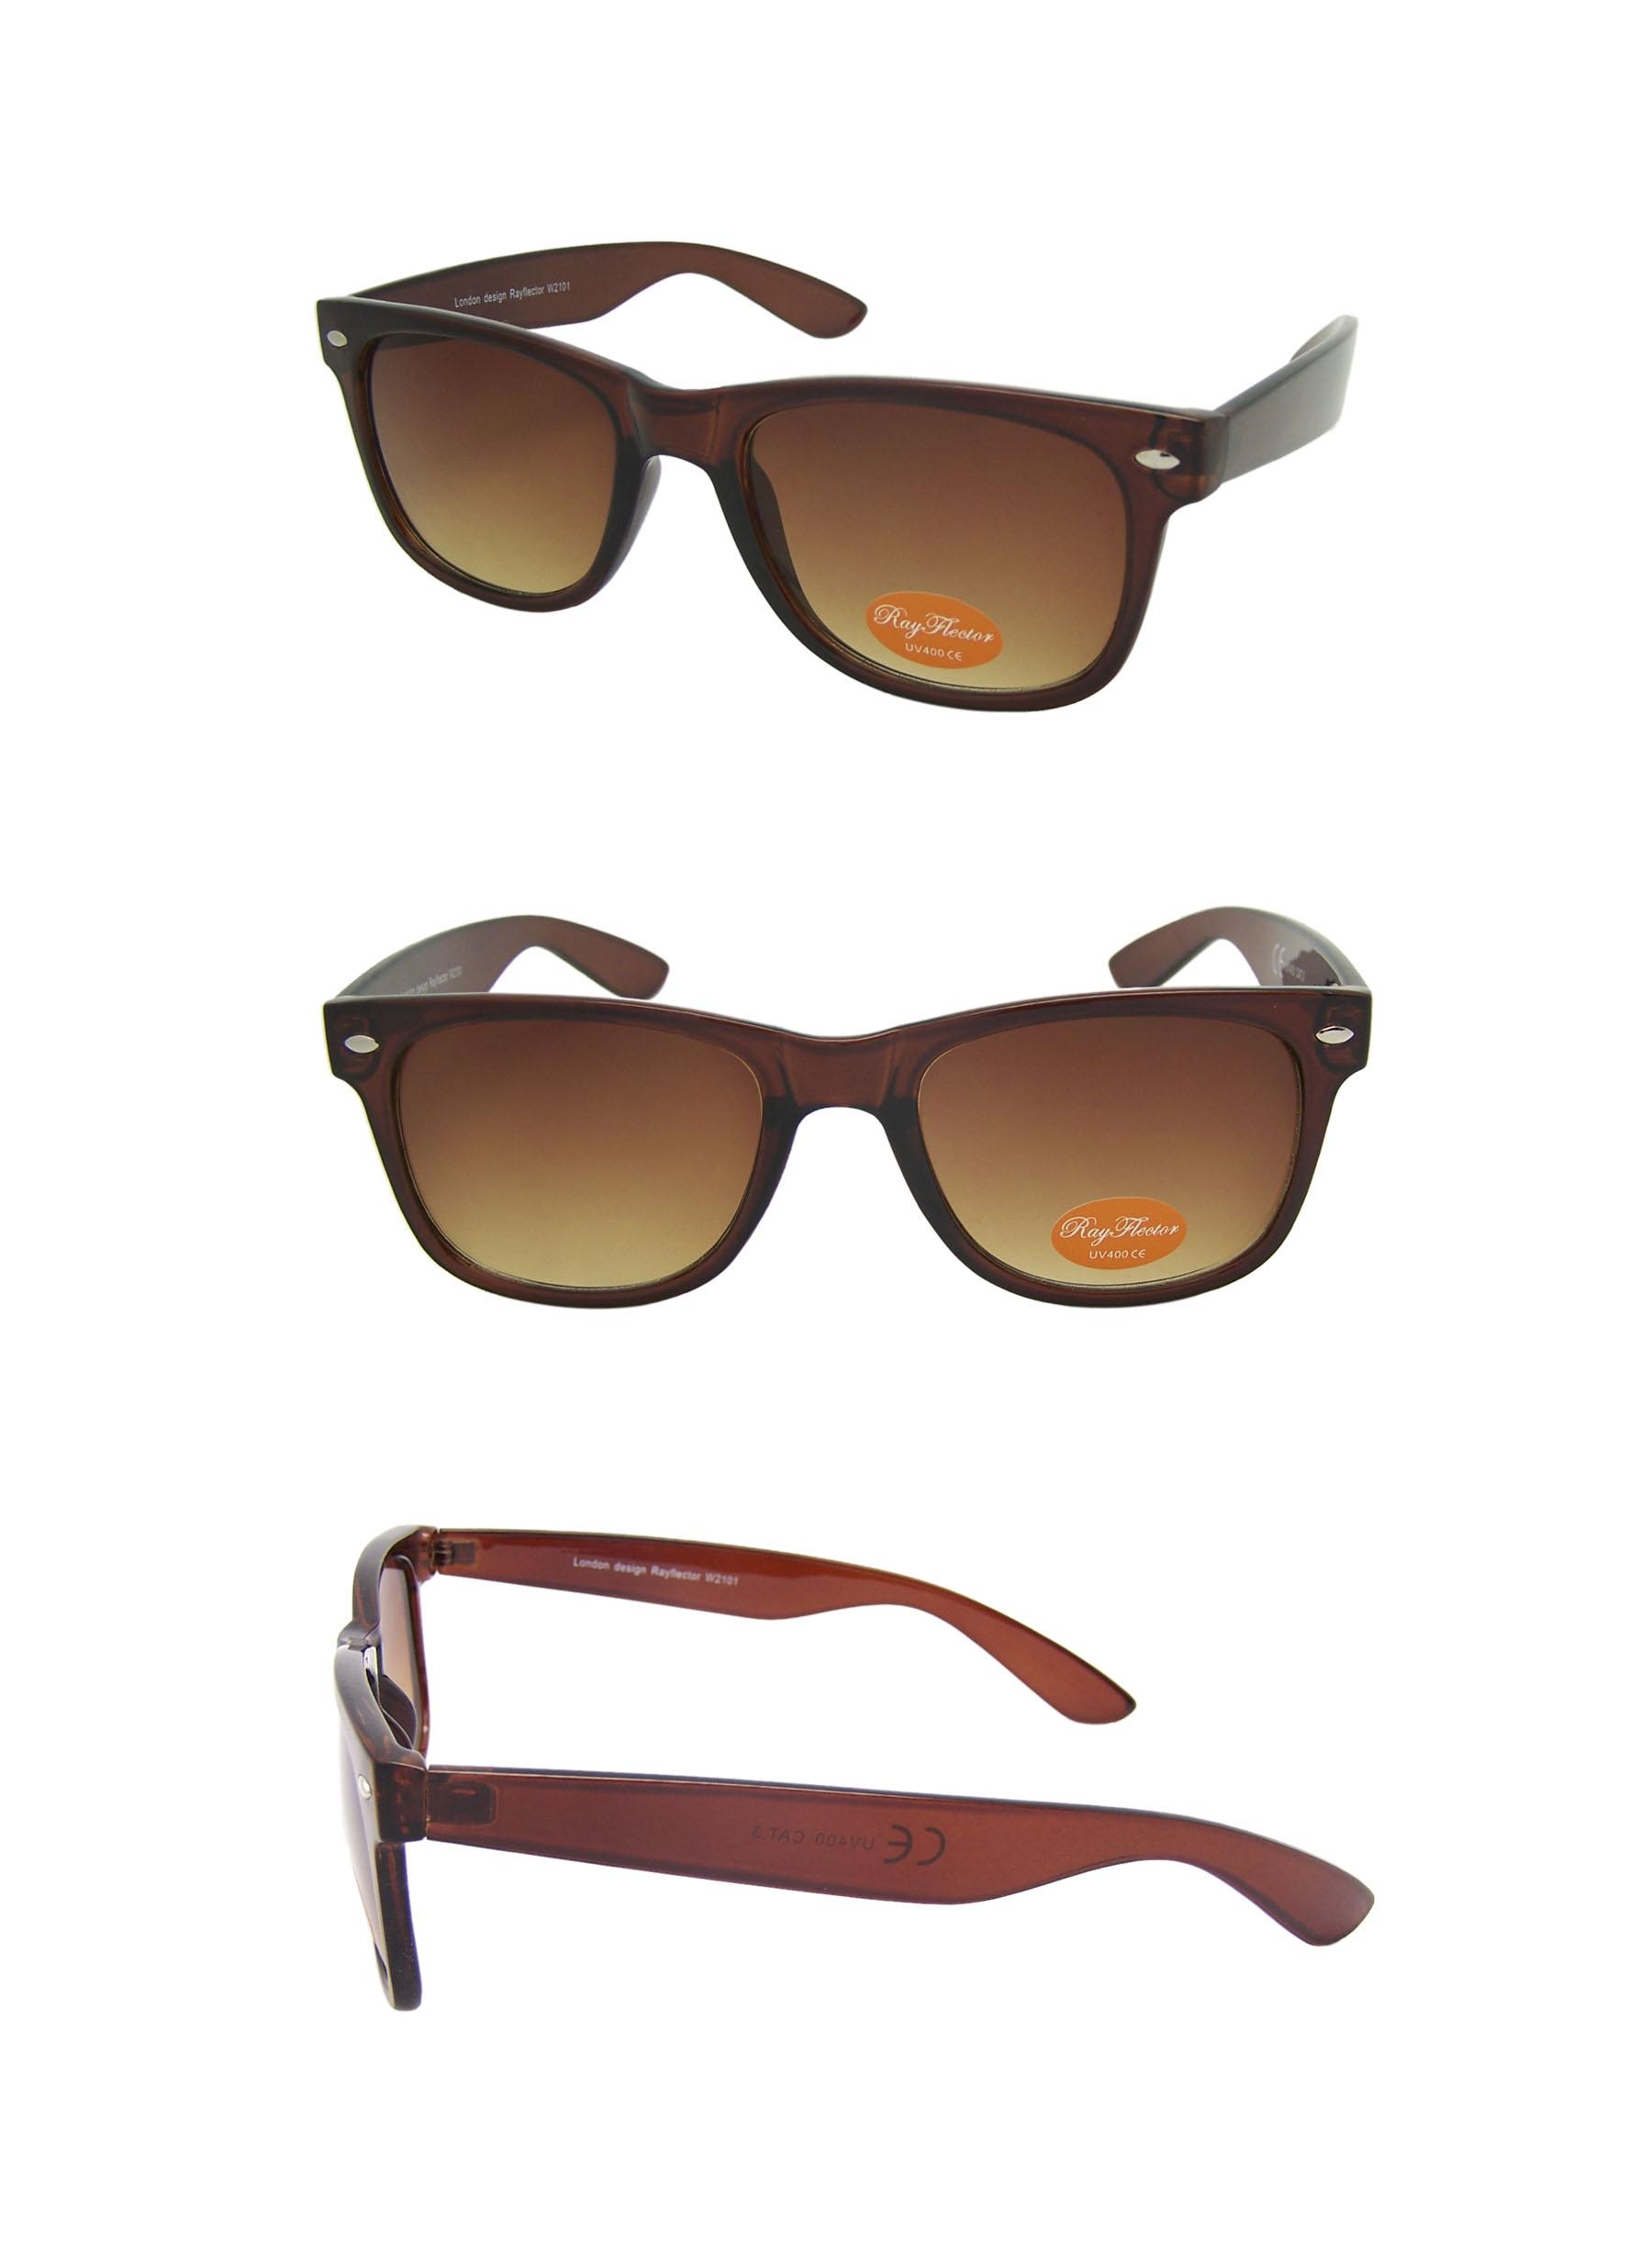 bda75cfc0de Classic Modern Wayfarer Style Sunglasses